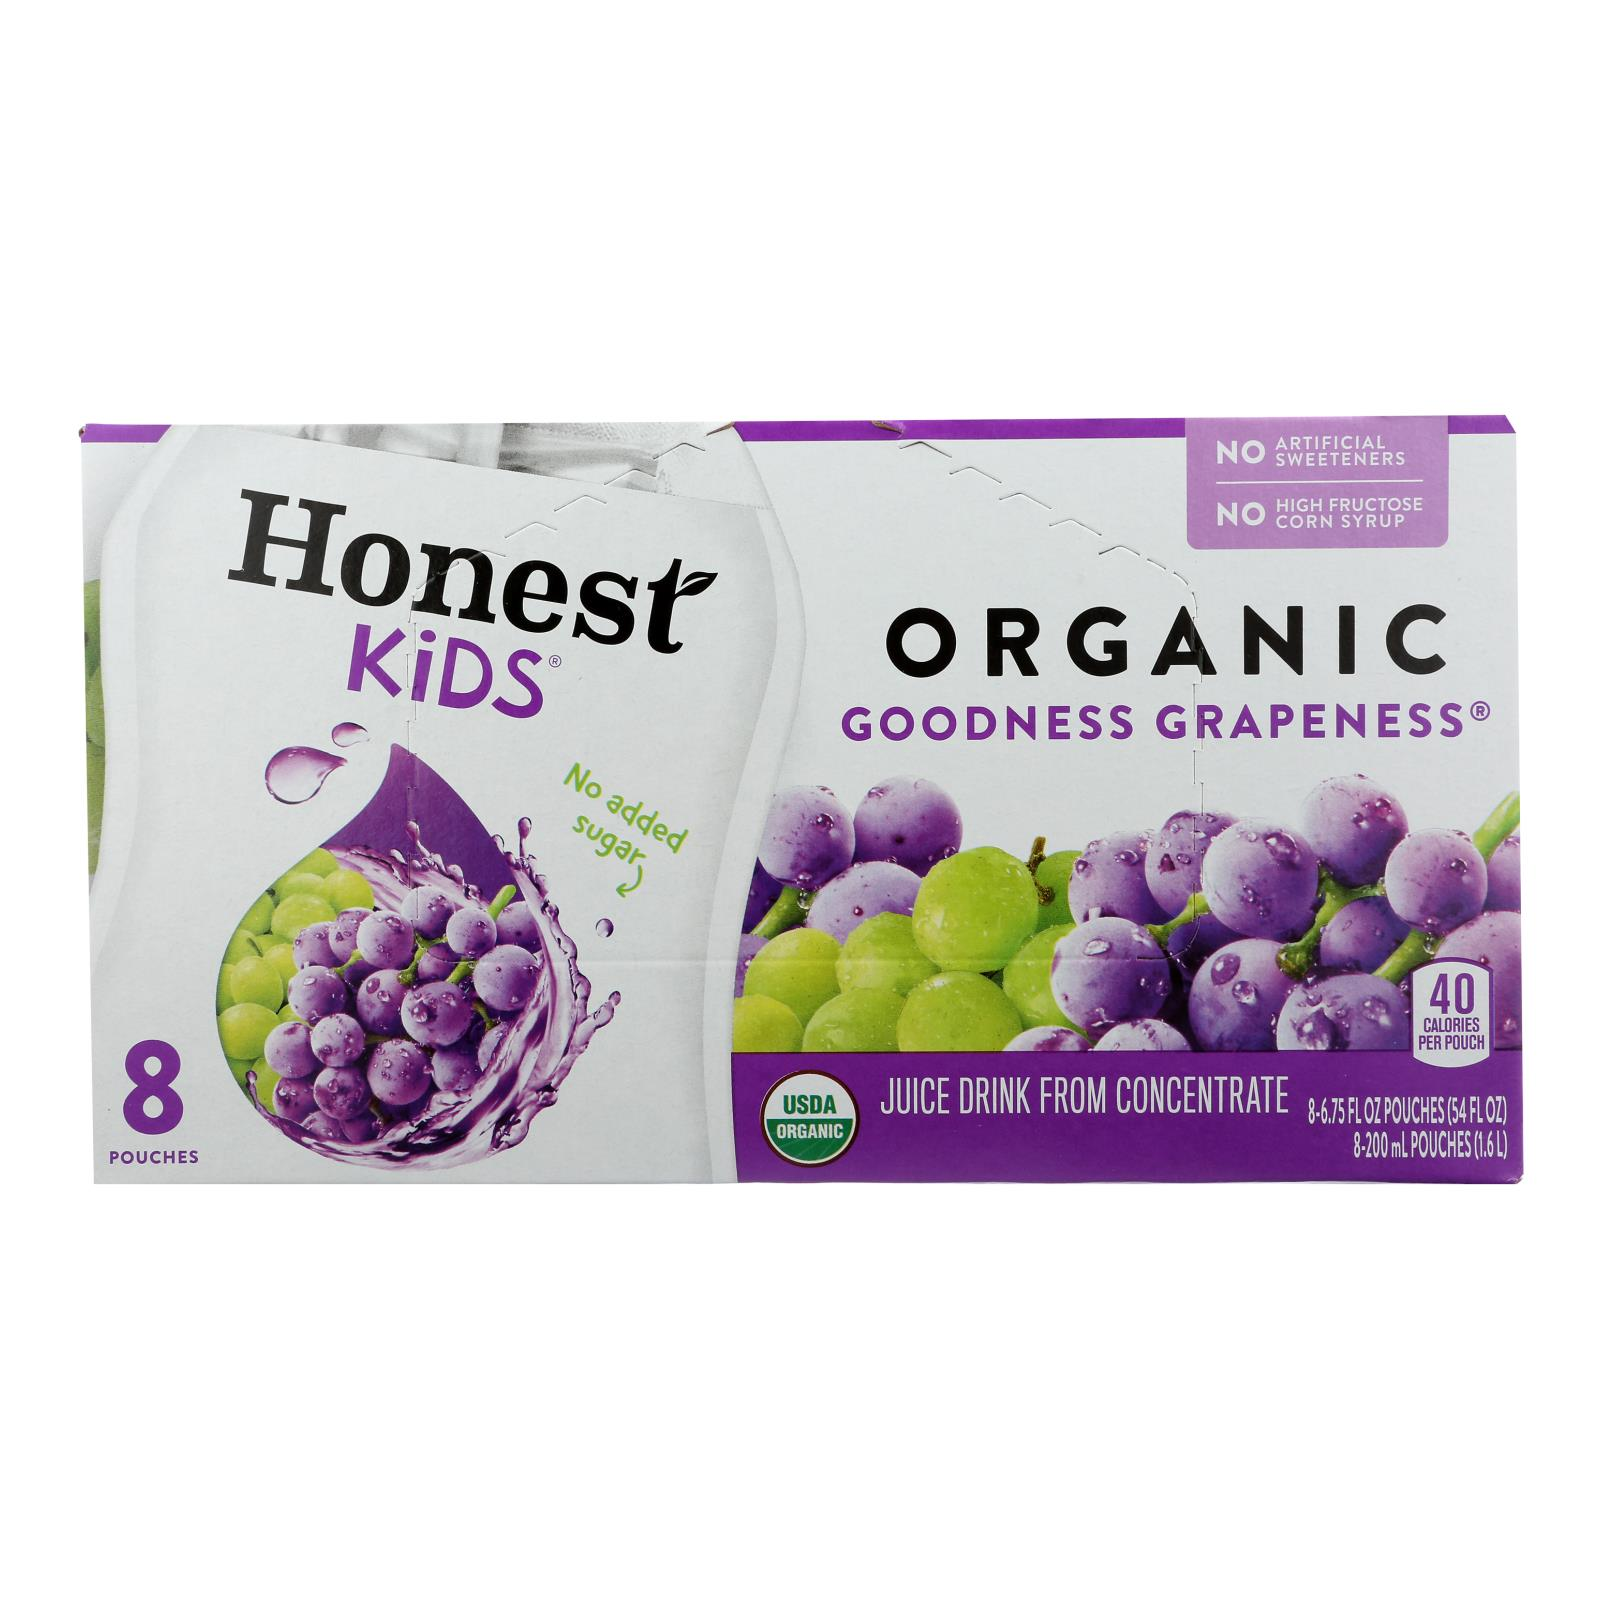 Honest Kids Honest Kids Goodness Grapeness - Goodness Grapeness - Case of 4 - 6.75 Fl oz.